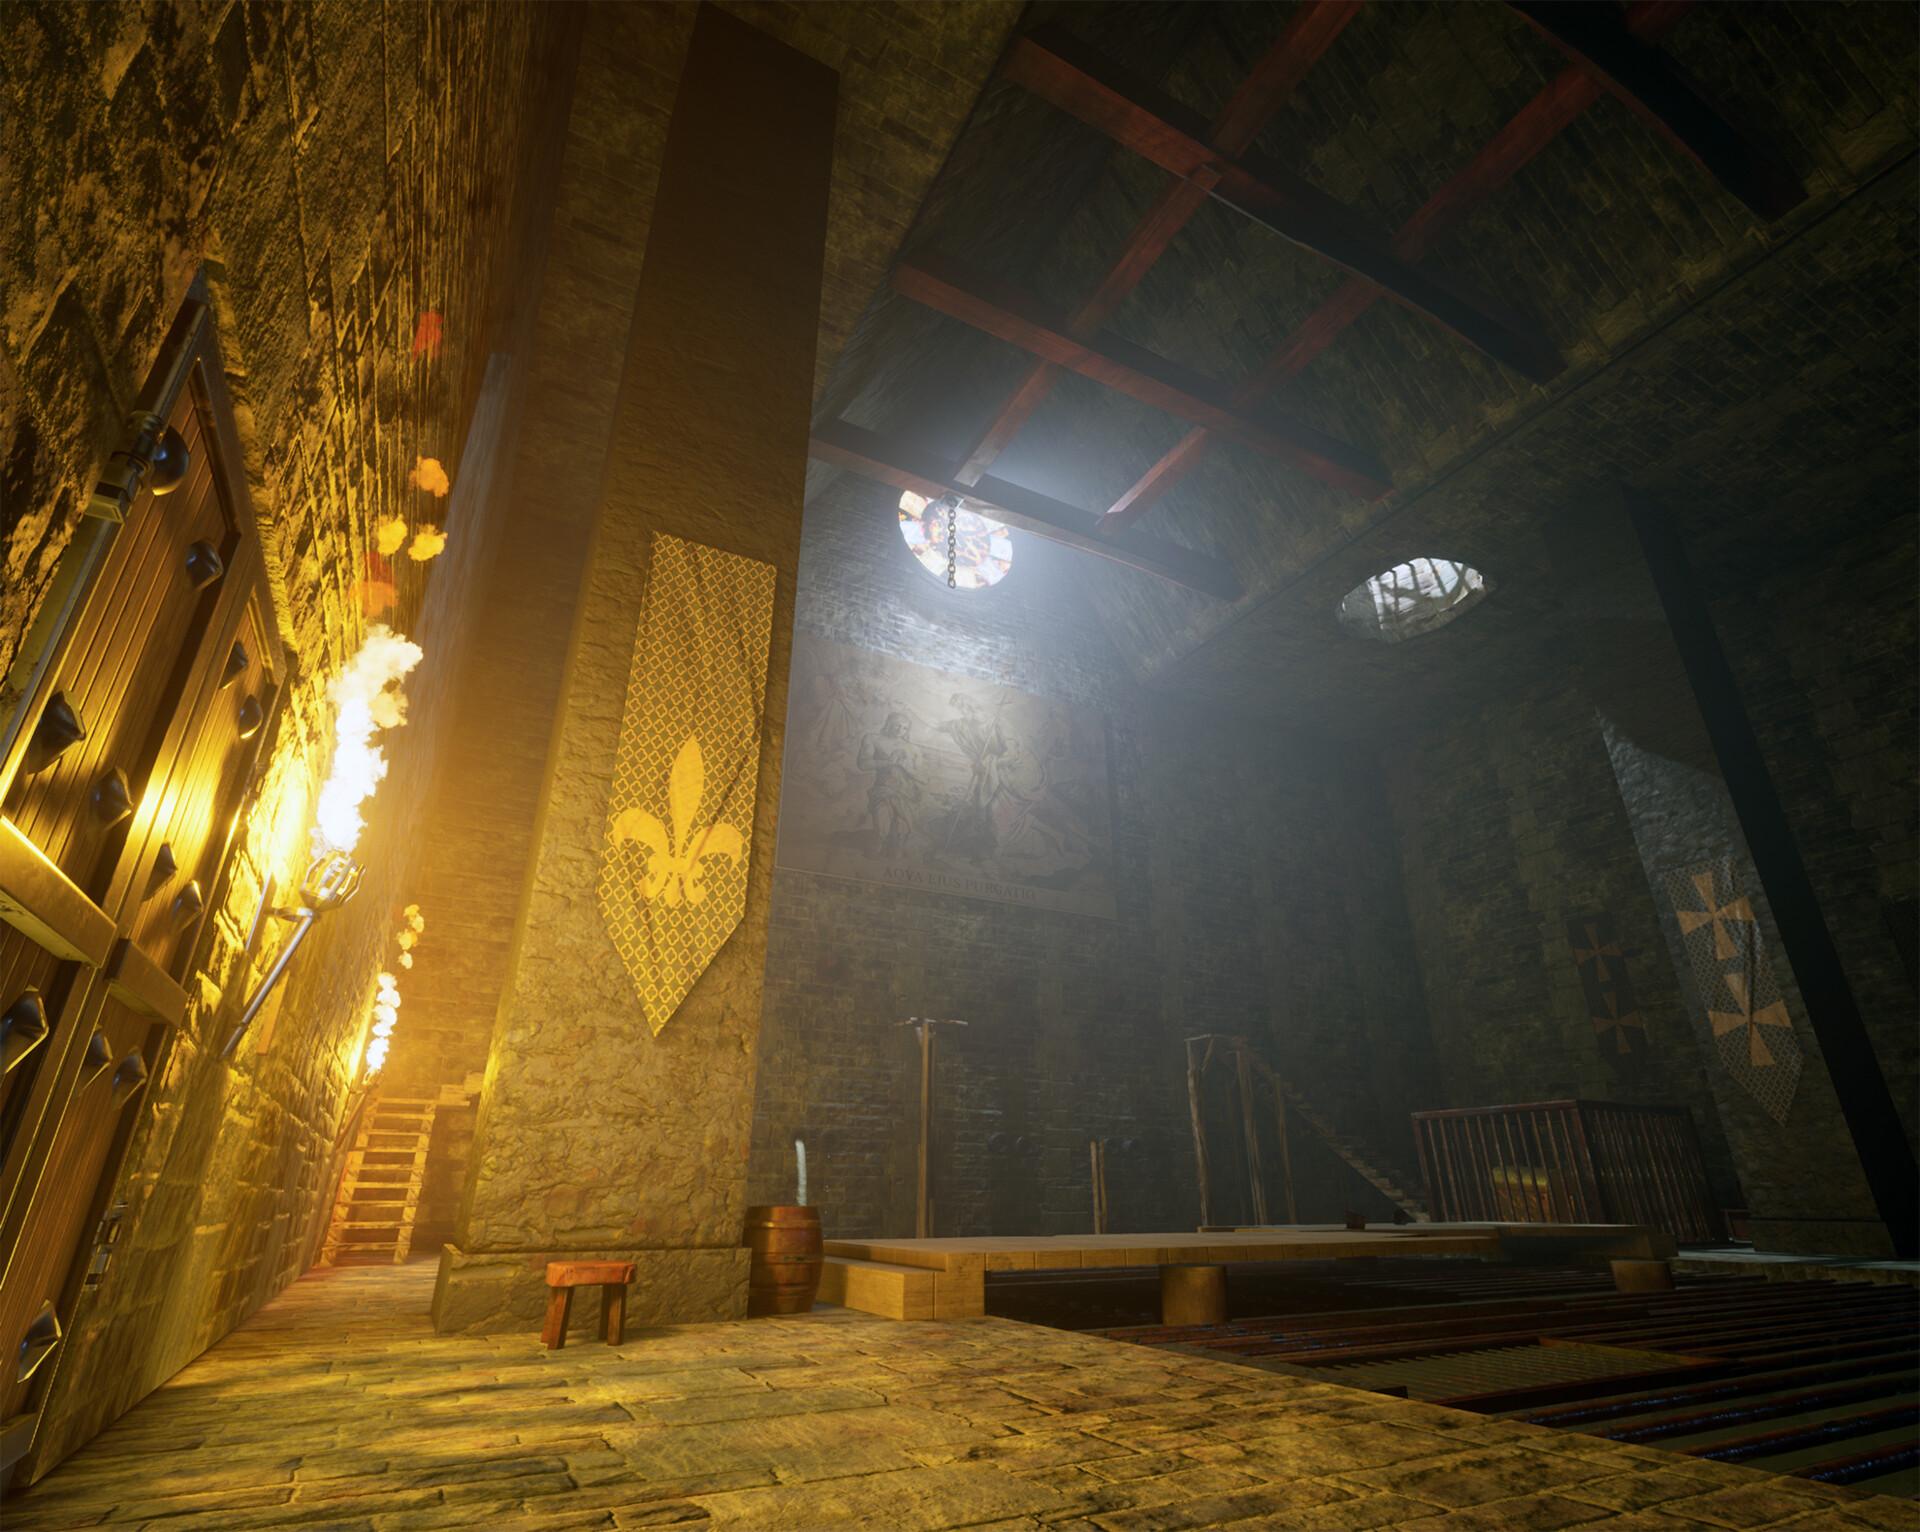 Dani palacio santolaria highresscreenshot00004